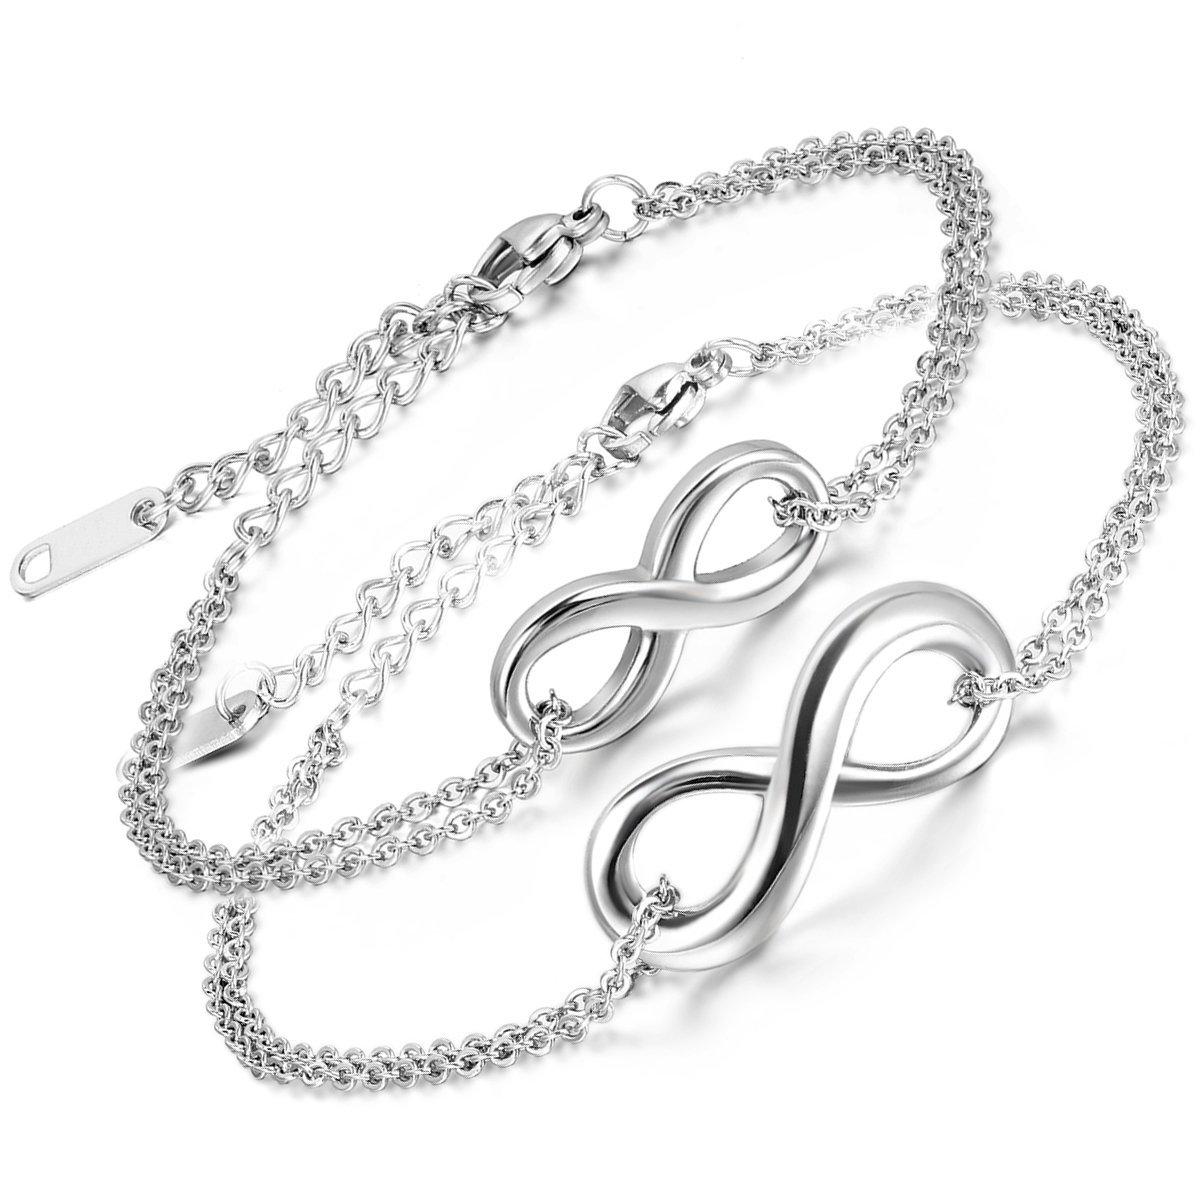 Aroncent 2-er Armband Infinity Armkette Damen Gliederarmband Partnerarmbänder Verstellbar Fußkettchen Edelstahl Armreifen Fußkette Freundschaftsarmband, Silber